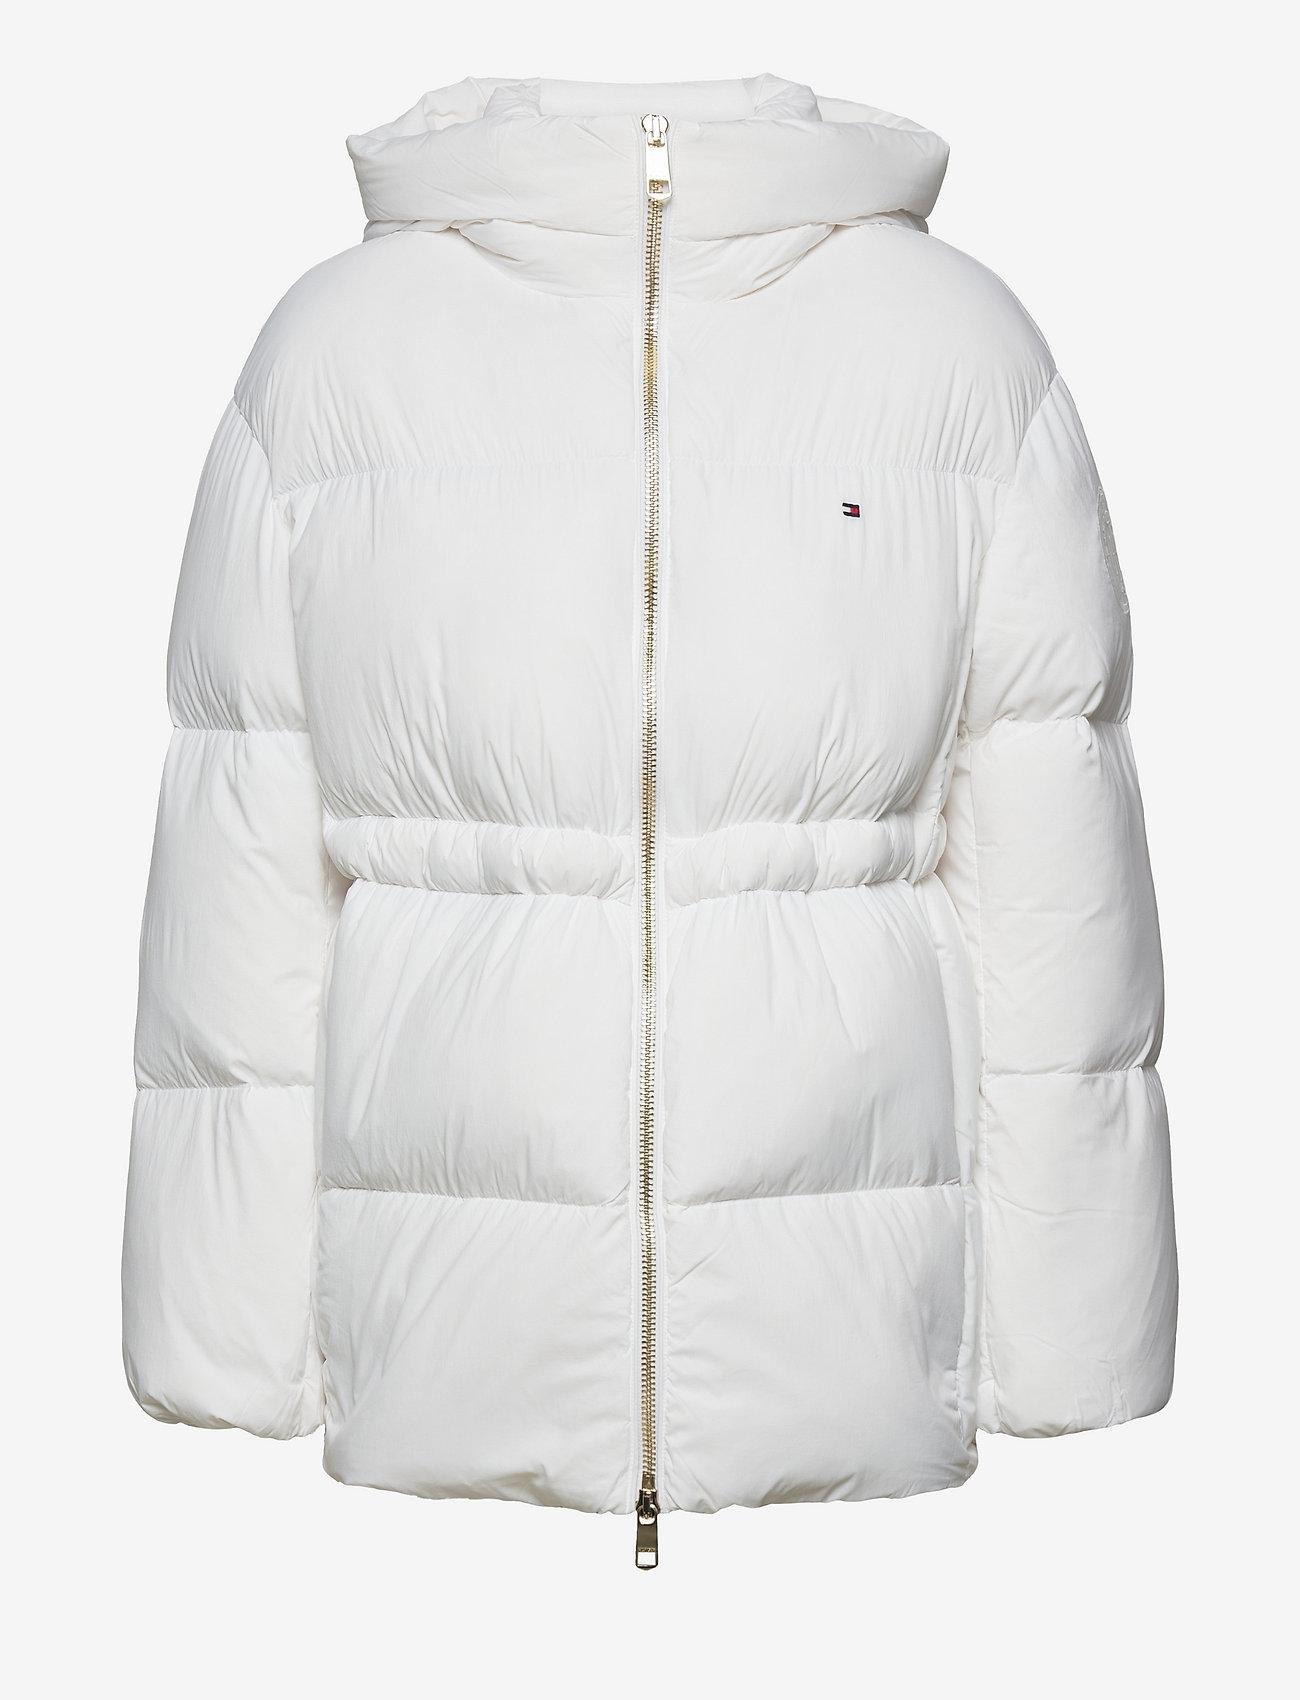 Tommy Hilfiger - NYLON DOWN PUFFER COAT - winter jackets - white - 0